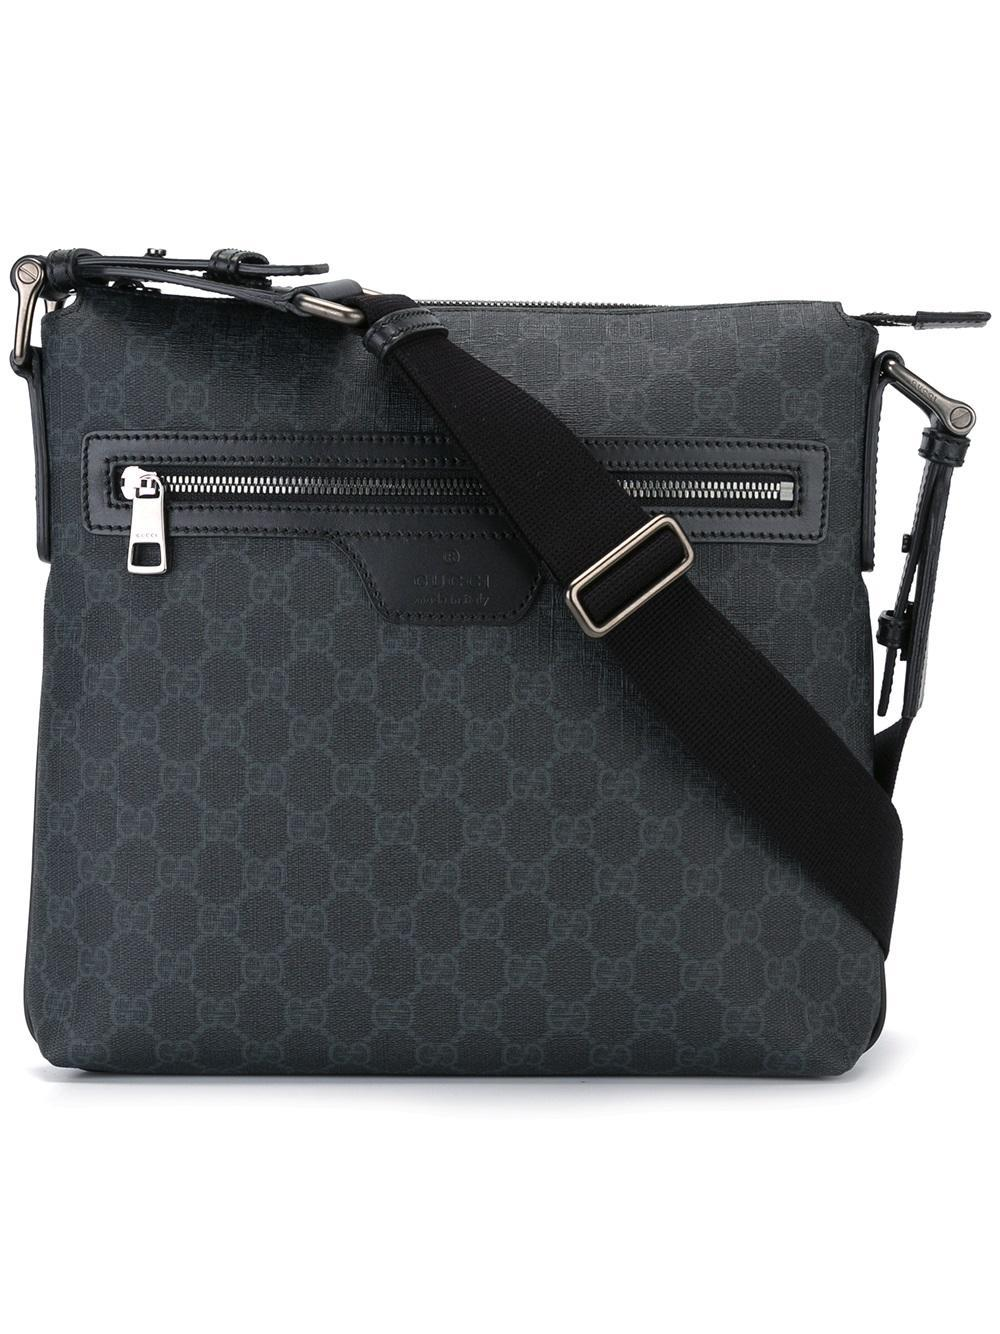 0ea084e90b7547 Gucci Gg Supreme Messenger Bag for Men - Lyst